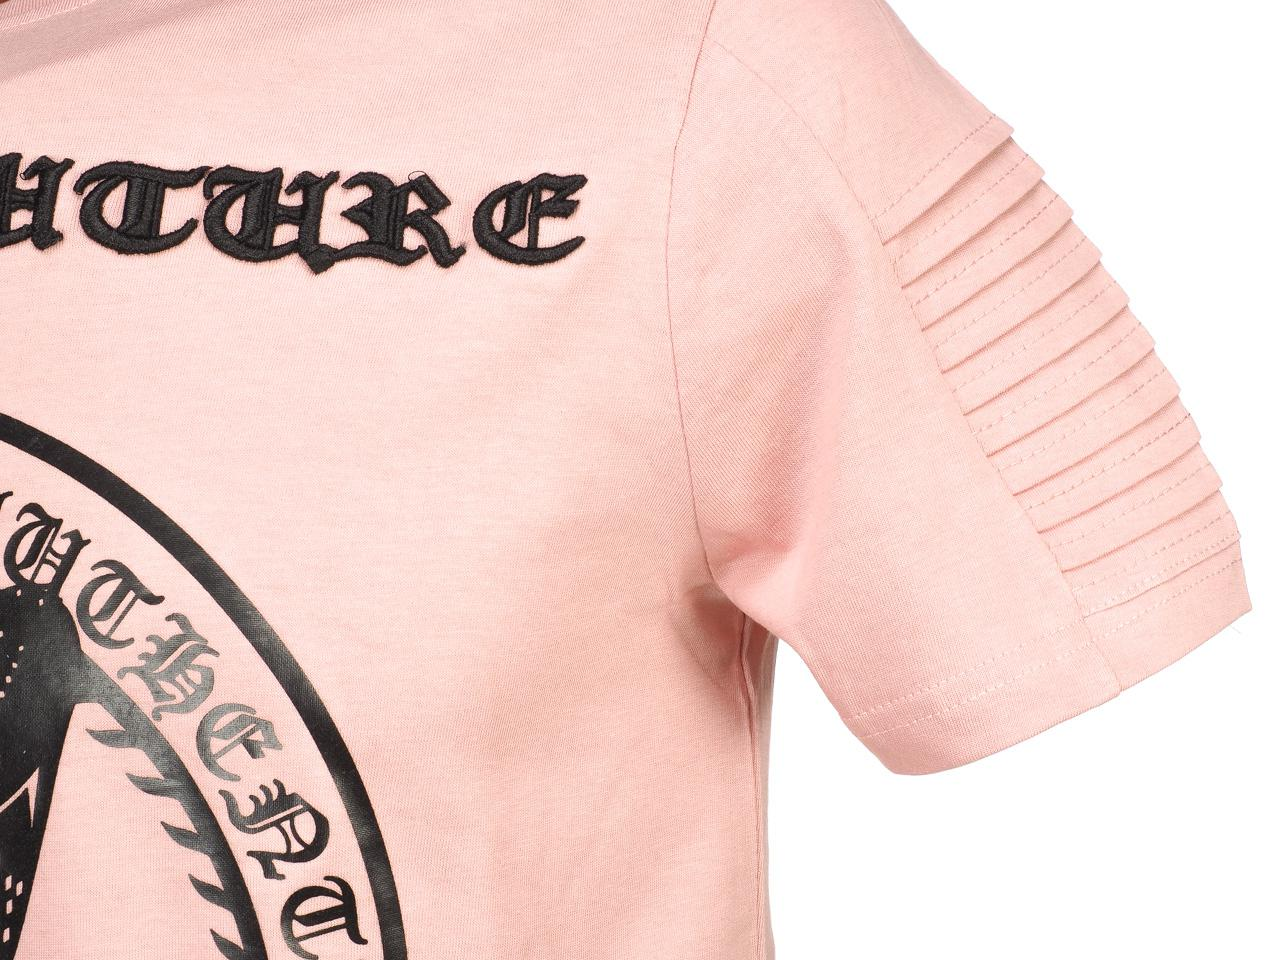 Short-Hite-Couture-Mafler-Pink-Mc-Tee-Pink-11529-New thumbnail 3